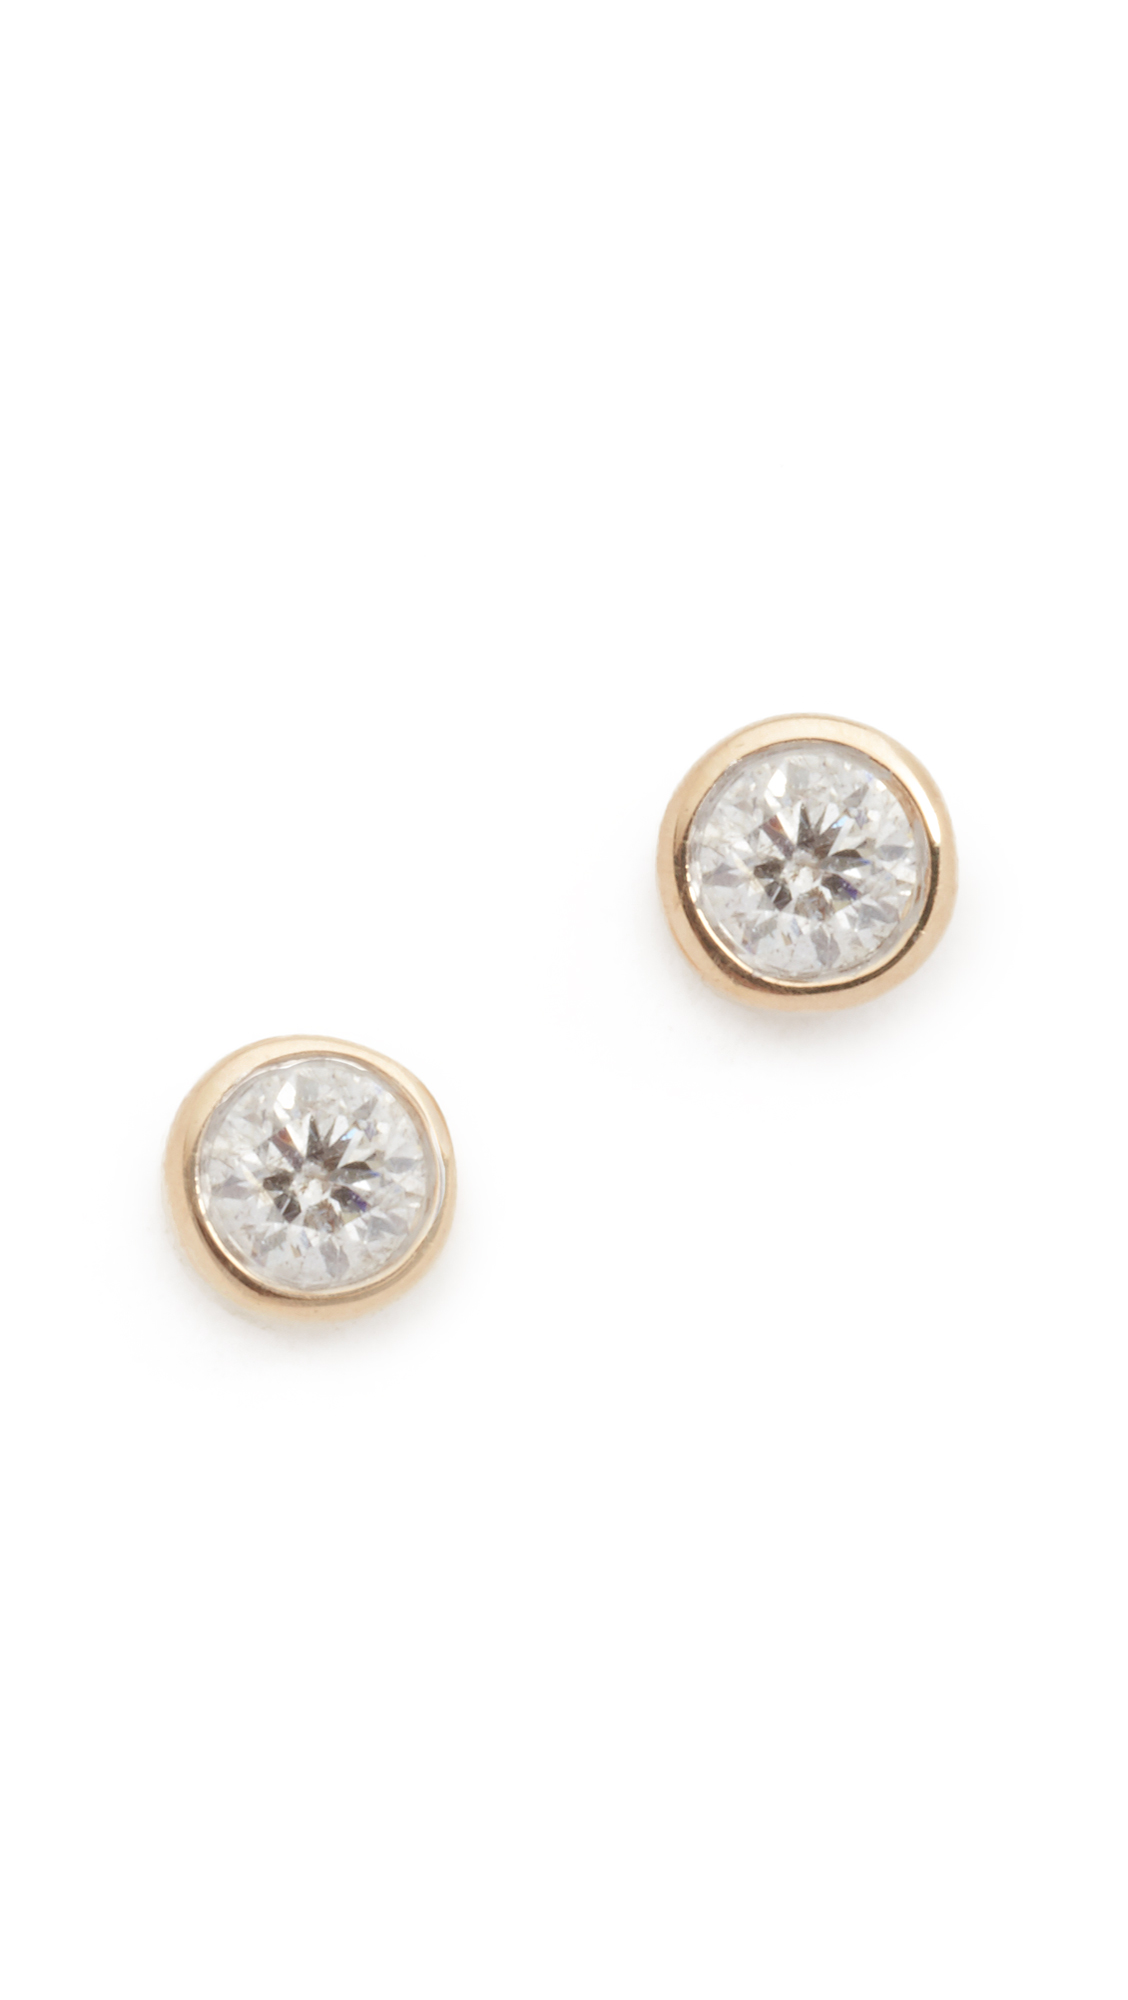 Adina Reyter 14k Gold Single Diamond Stud Earrings - Gold